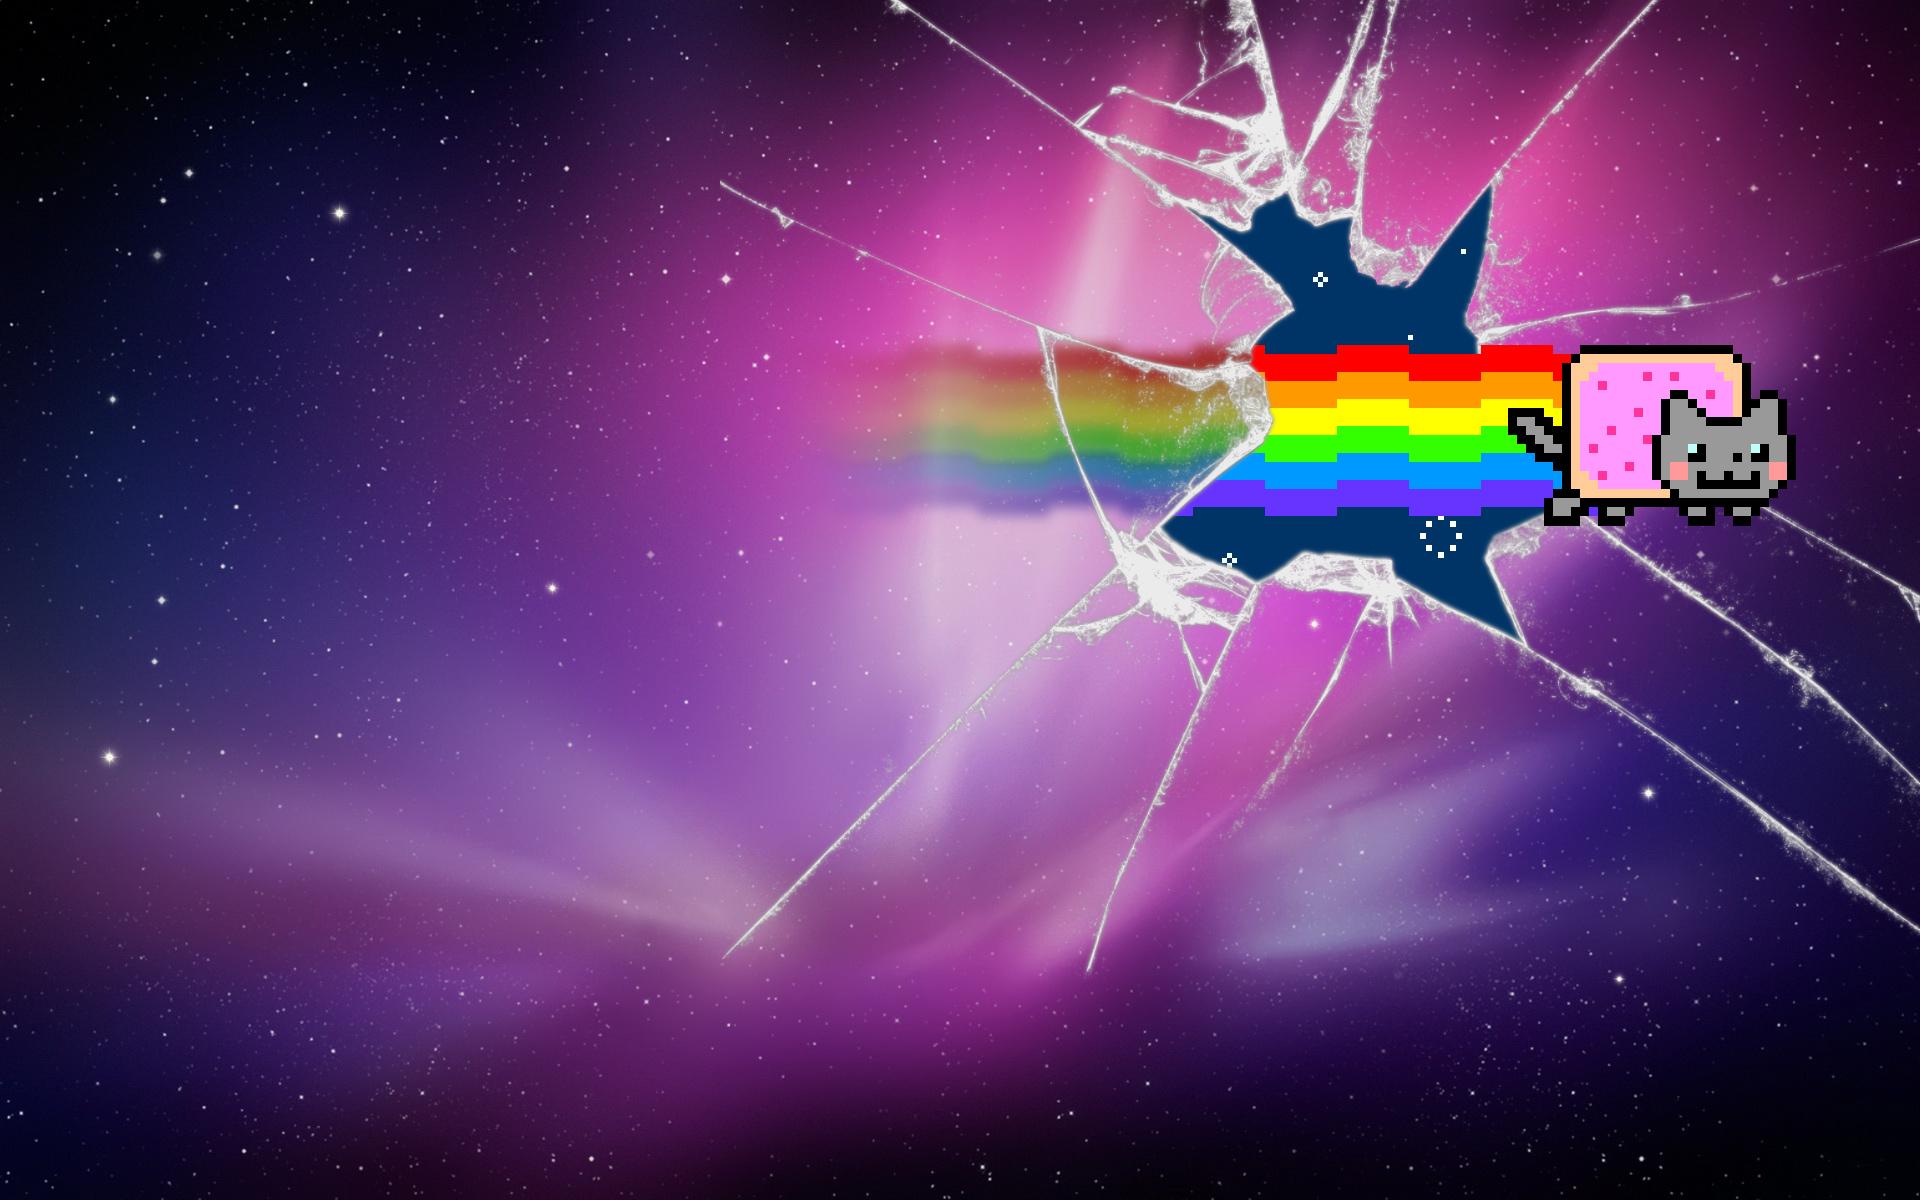 Nyan Cat Wallpapers - HD Wallpaper